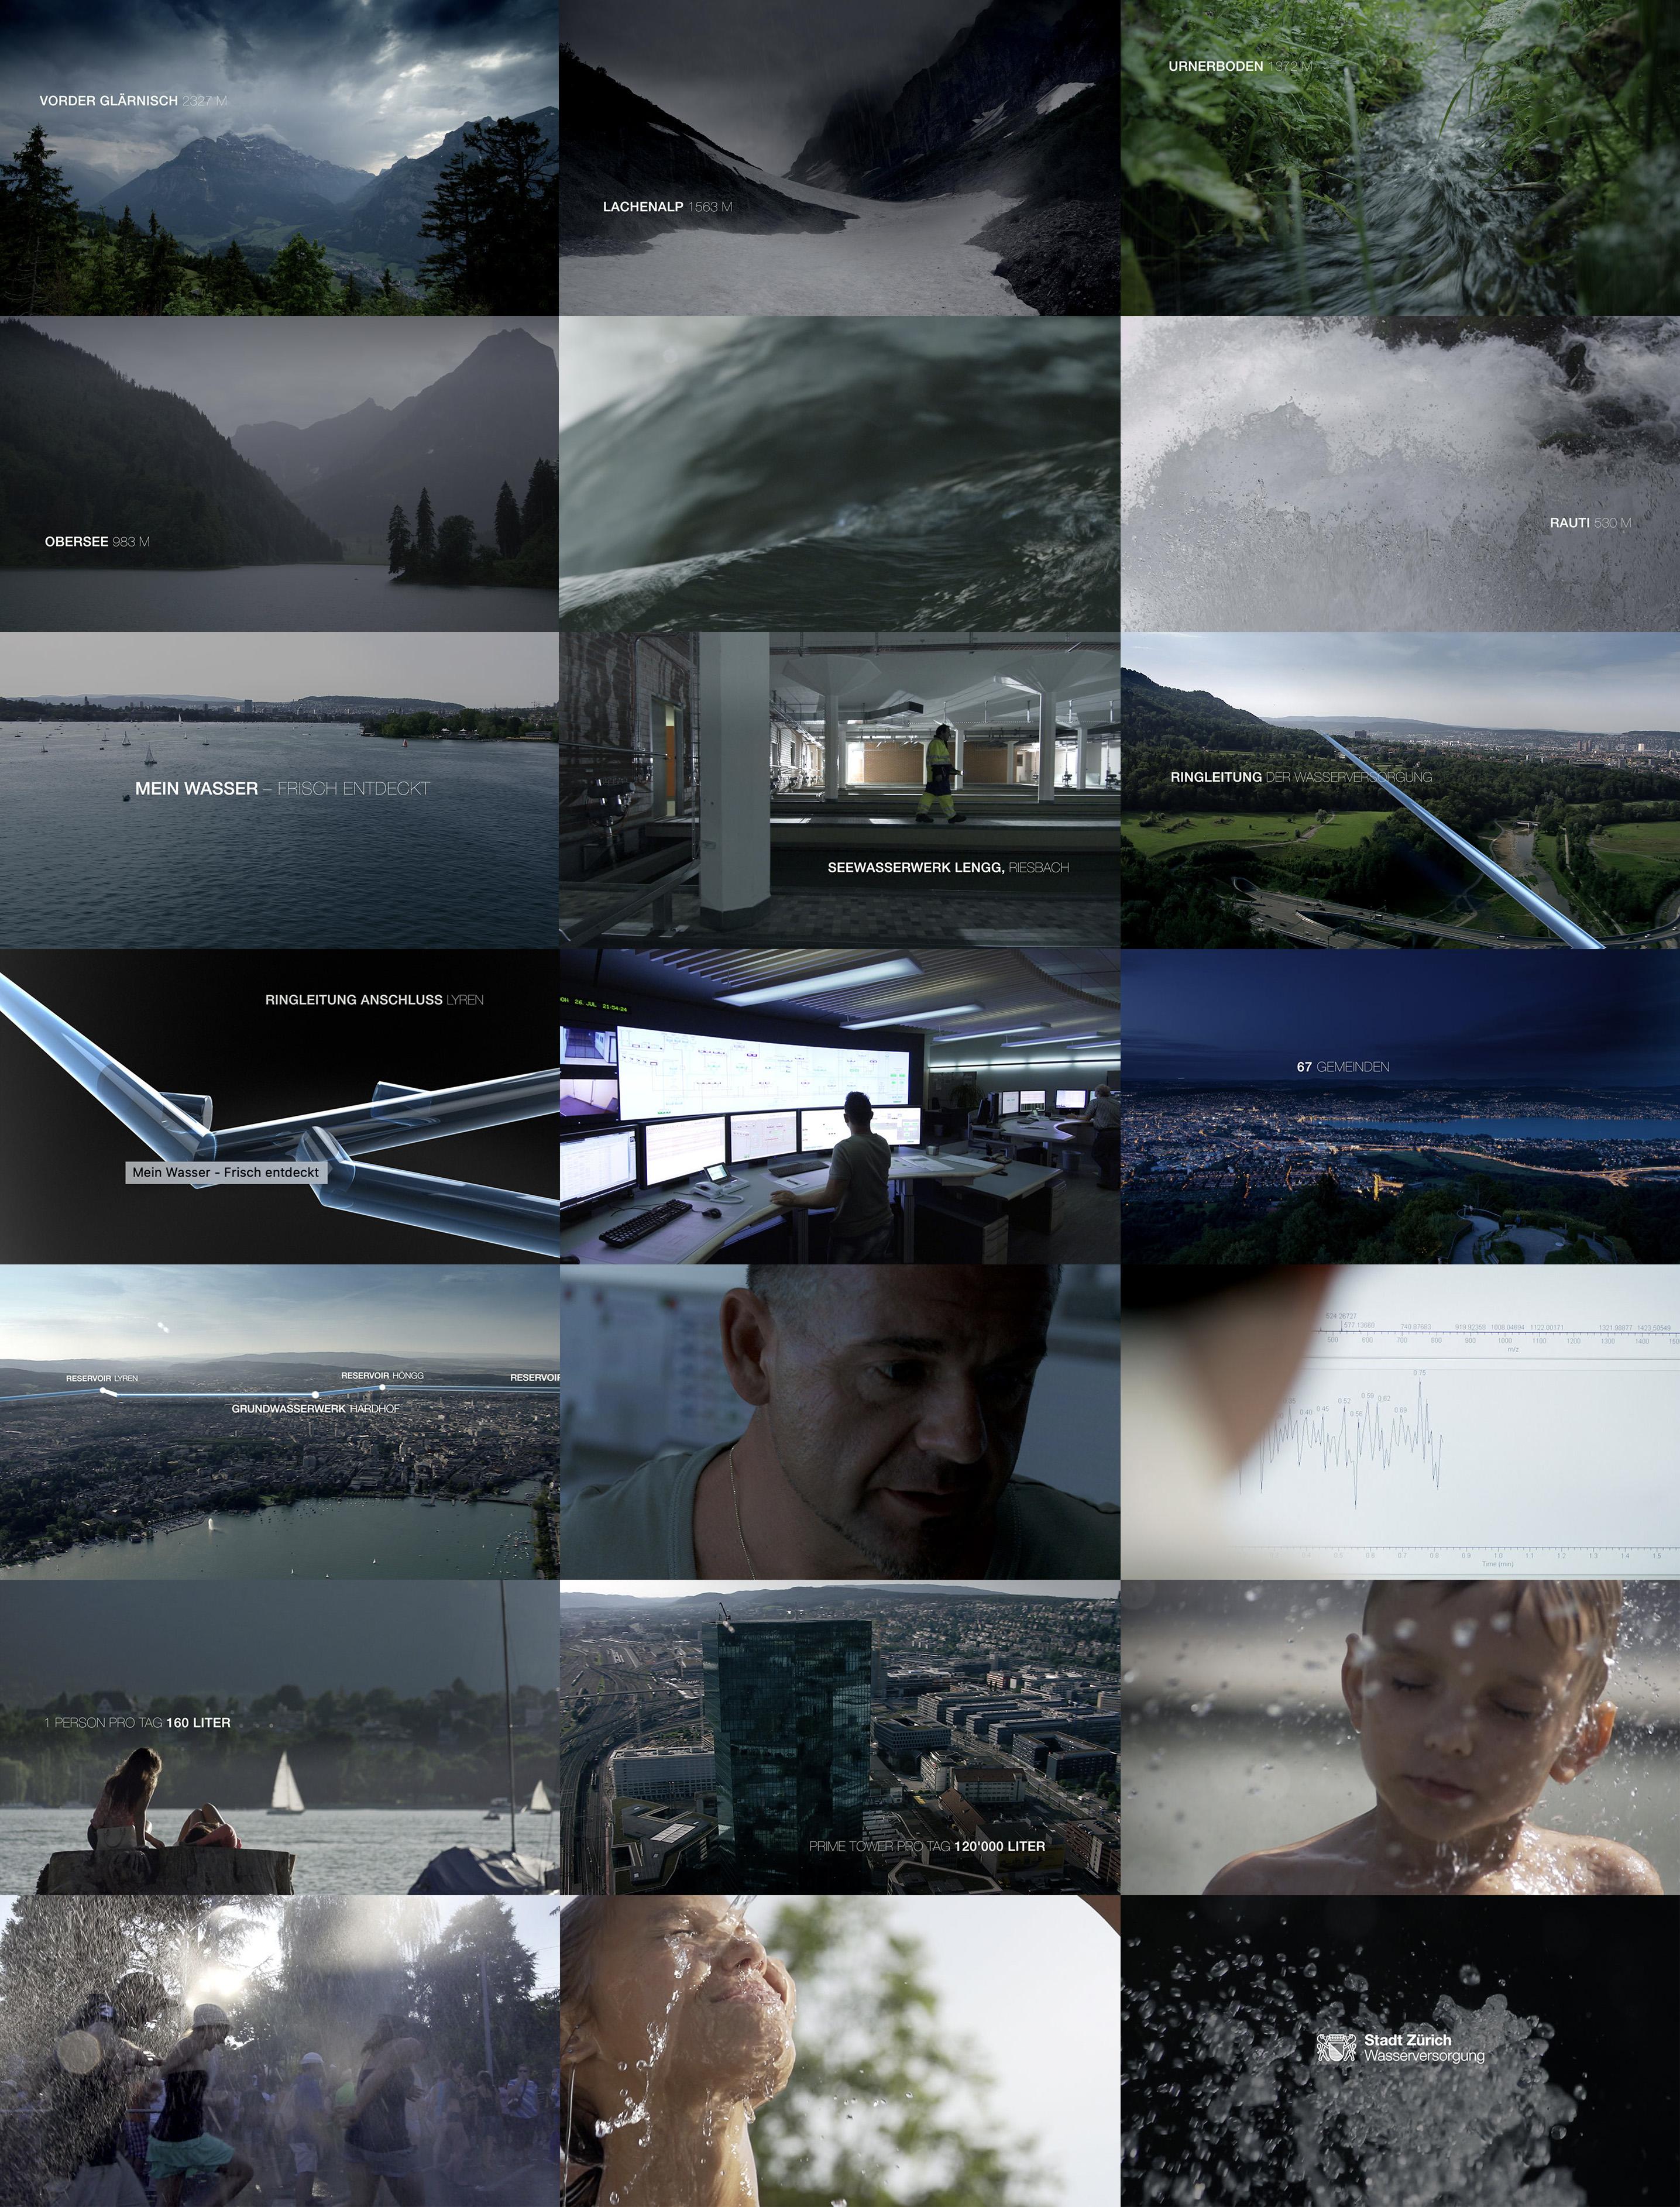 Mein Wasser - Frisch entdeckt, Concept Development, Film Editing, Title Design, Grading, Art Direction, Michael Frei Zurich